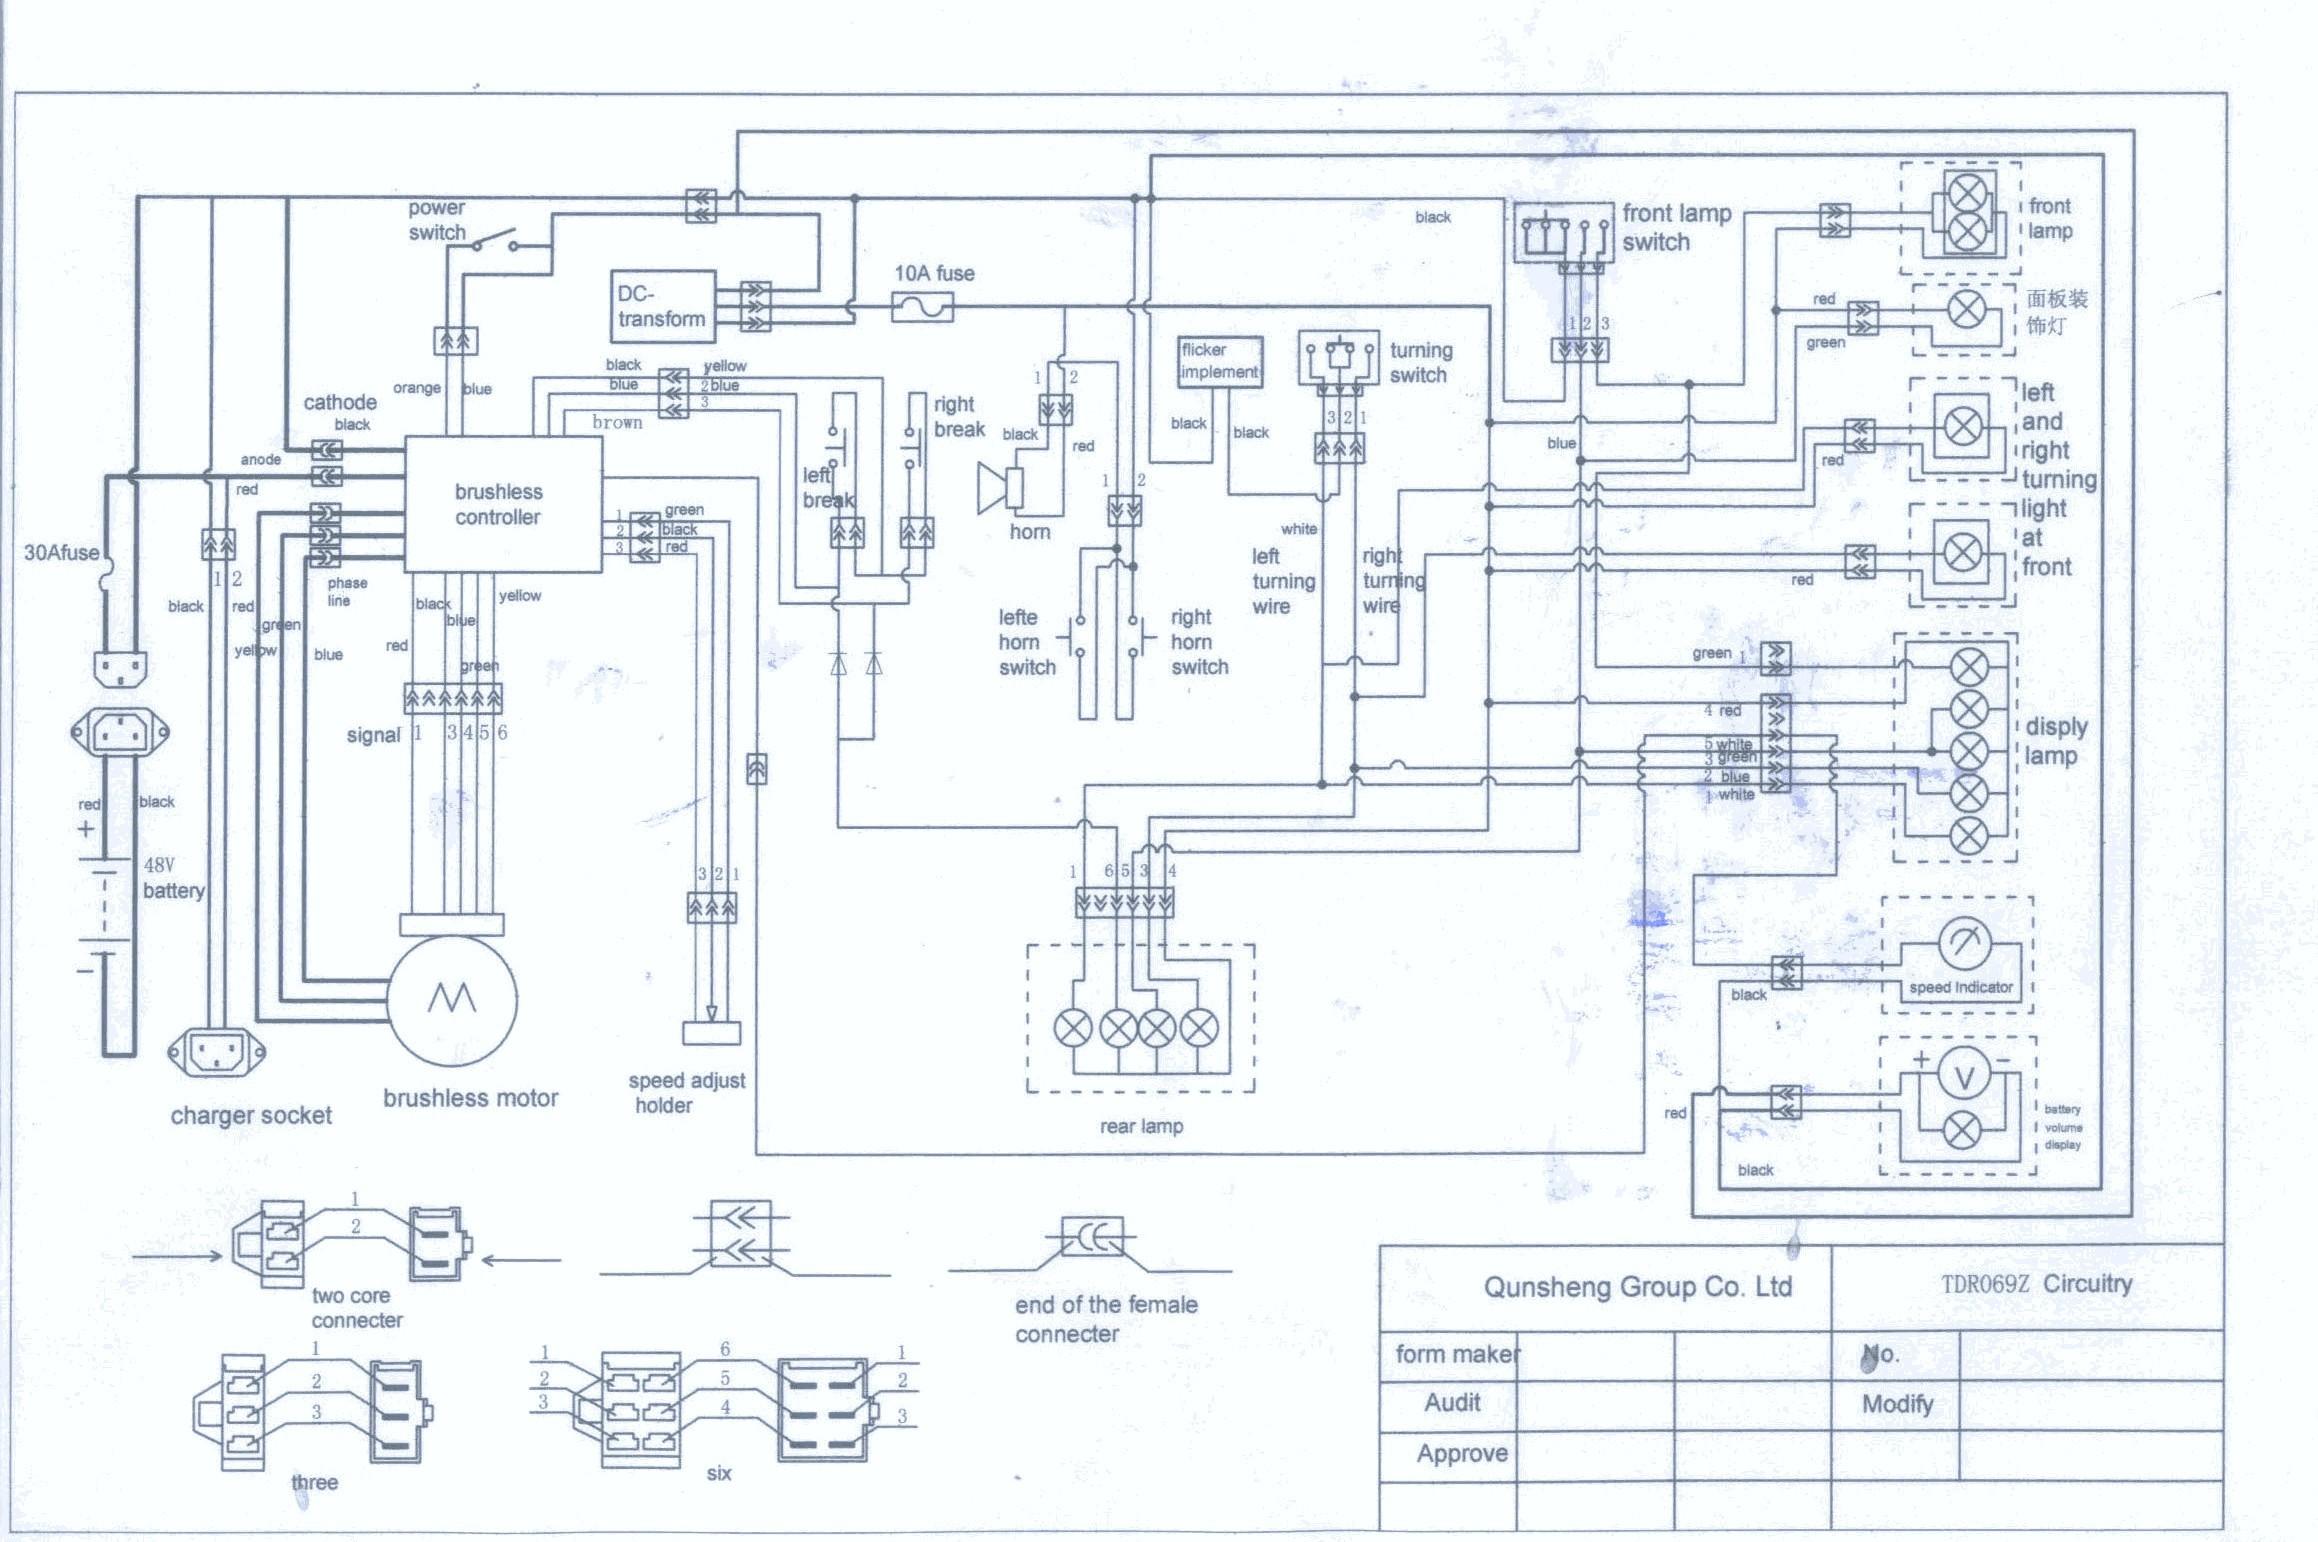 schumacher battery charger se 5212a wiring diagram best of schumacher battery charger se 4020 wiring diagram image of schumacher battery charger se 5212a wiring diagram